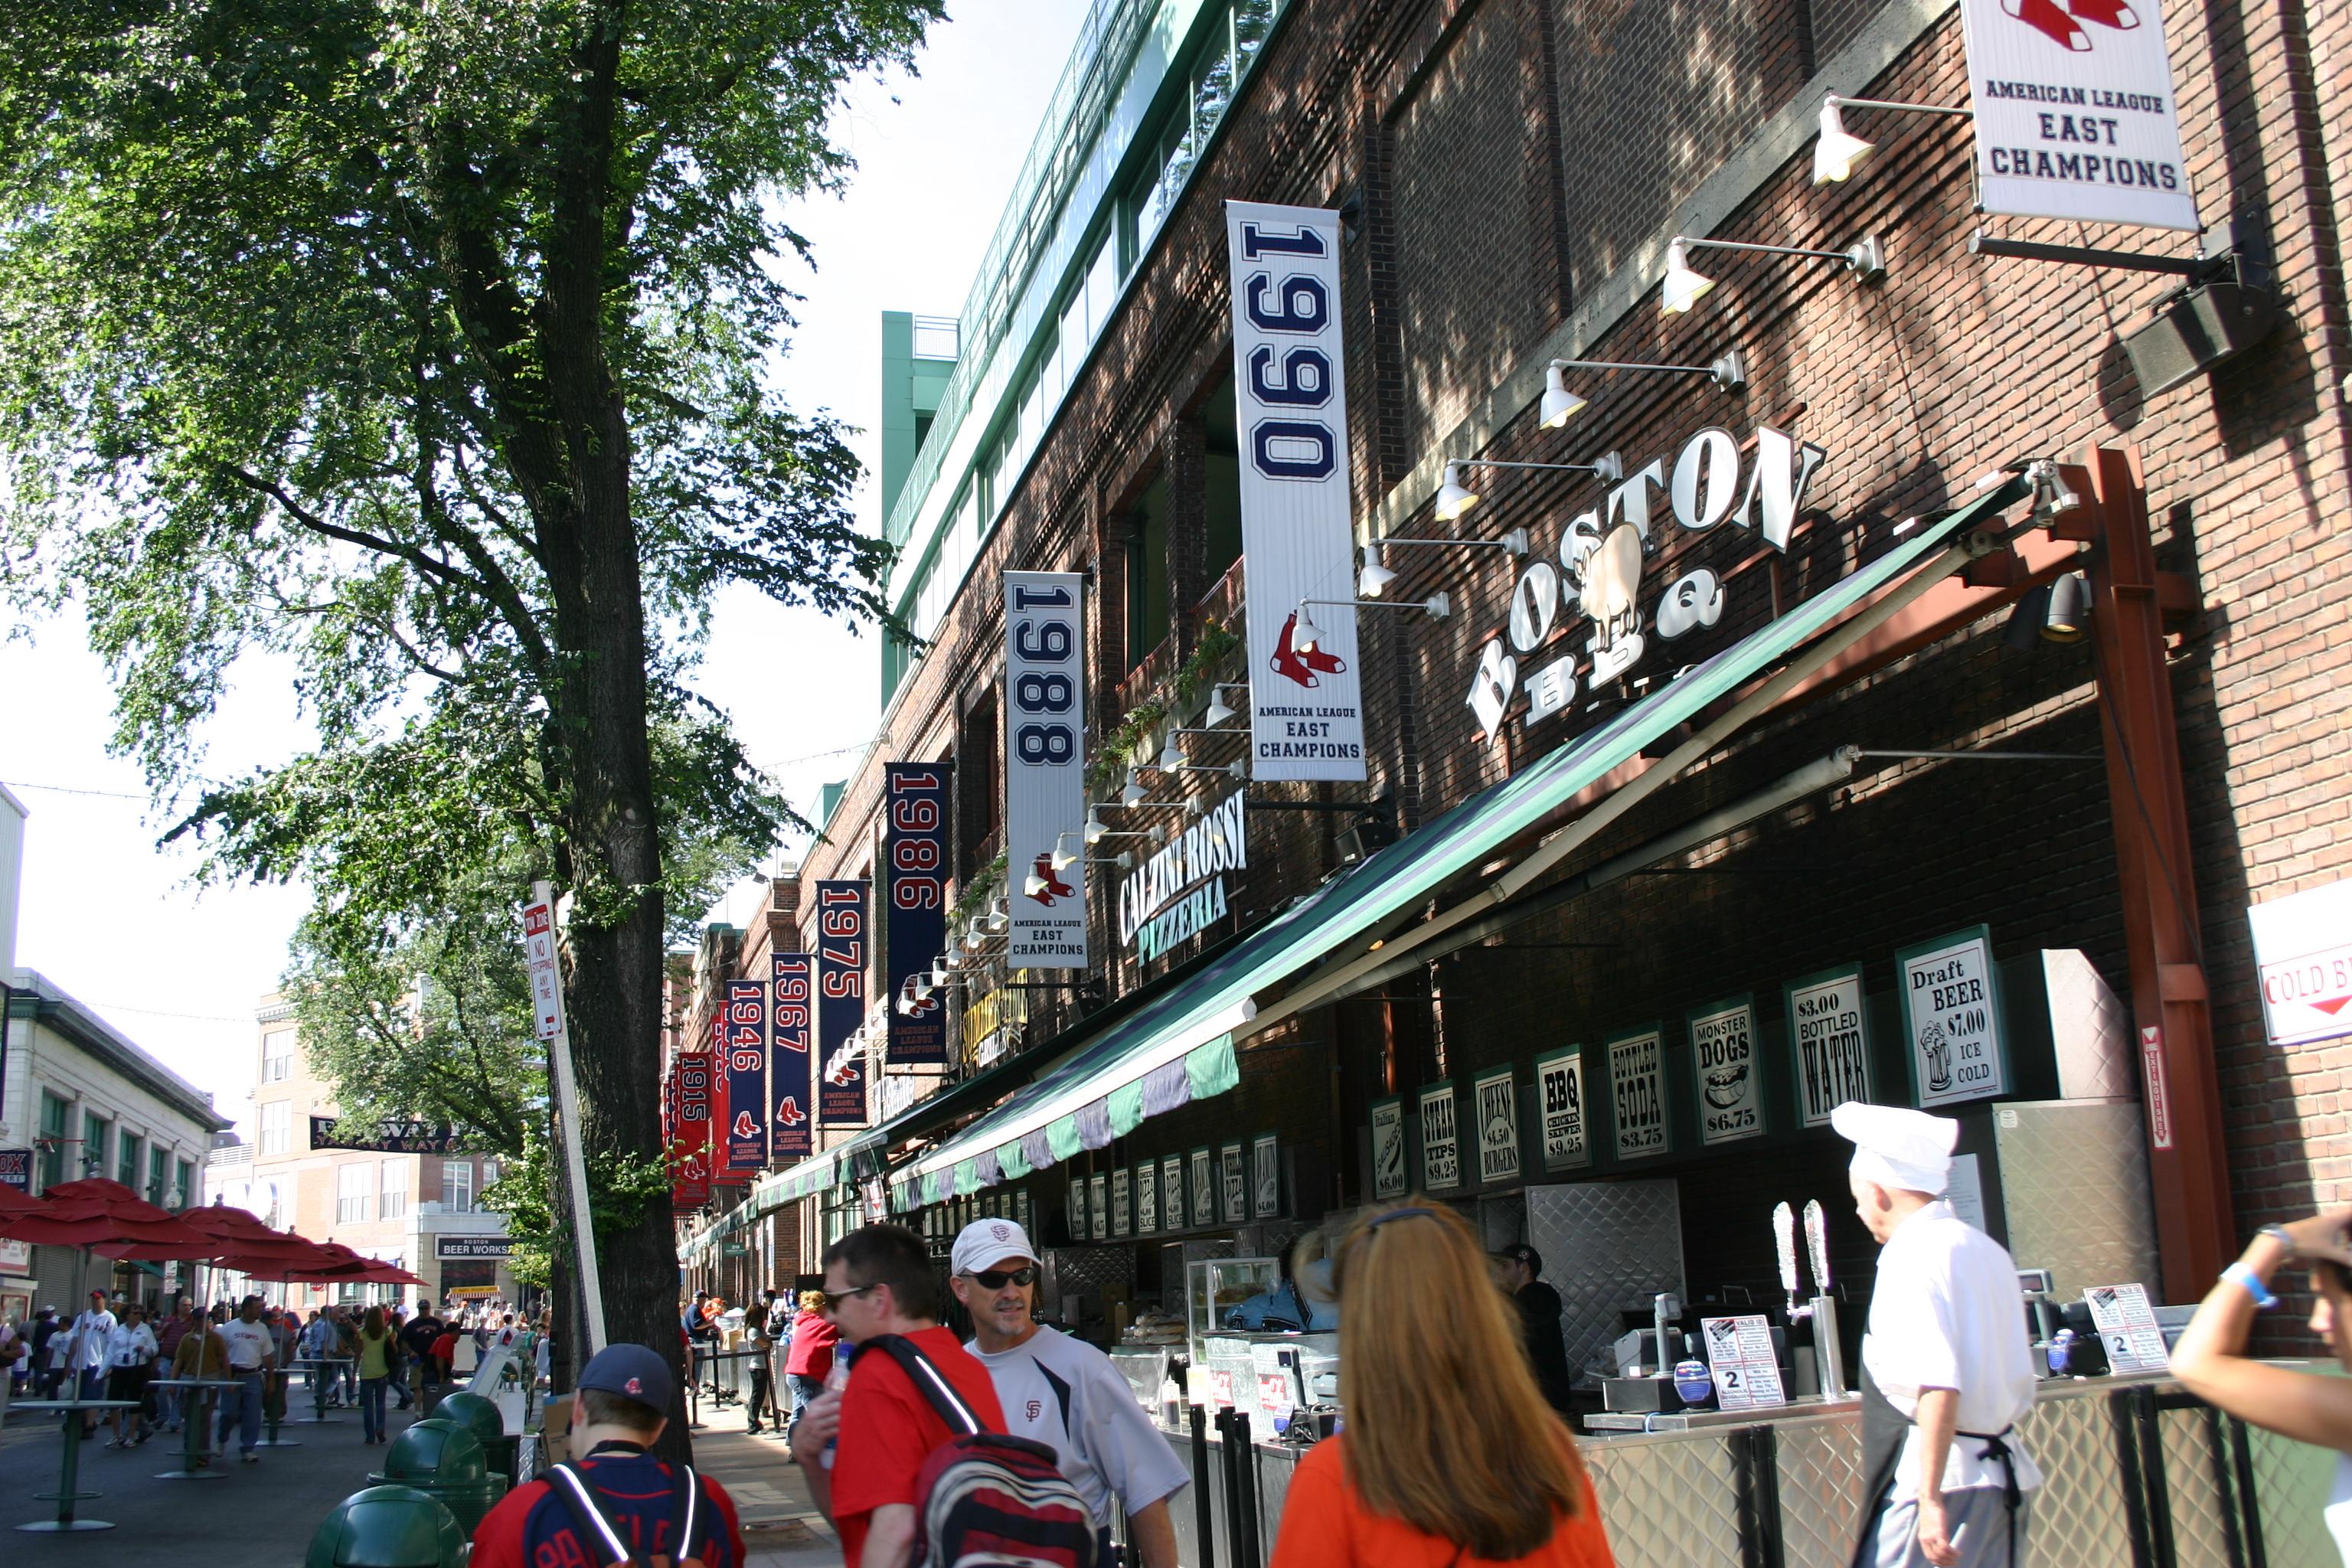 Fenway Park,Yawkey Way,Red Sox,Boston,baseball trips